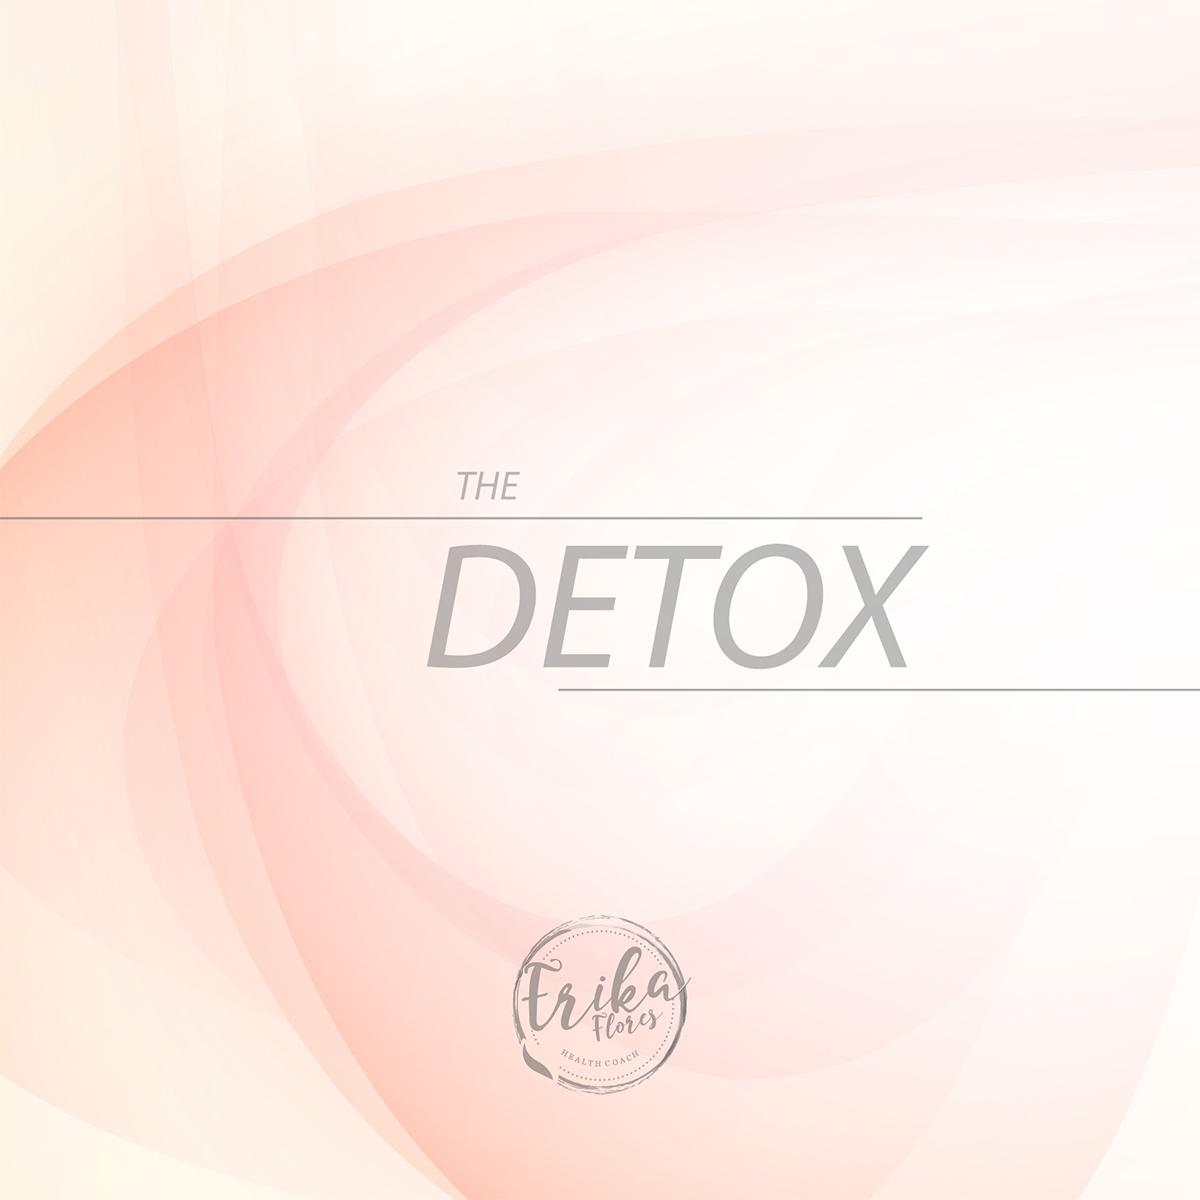 detox3 (1).jpg